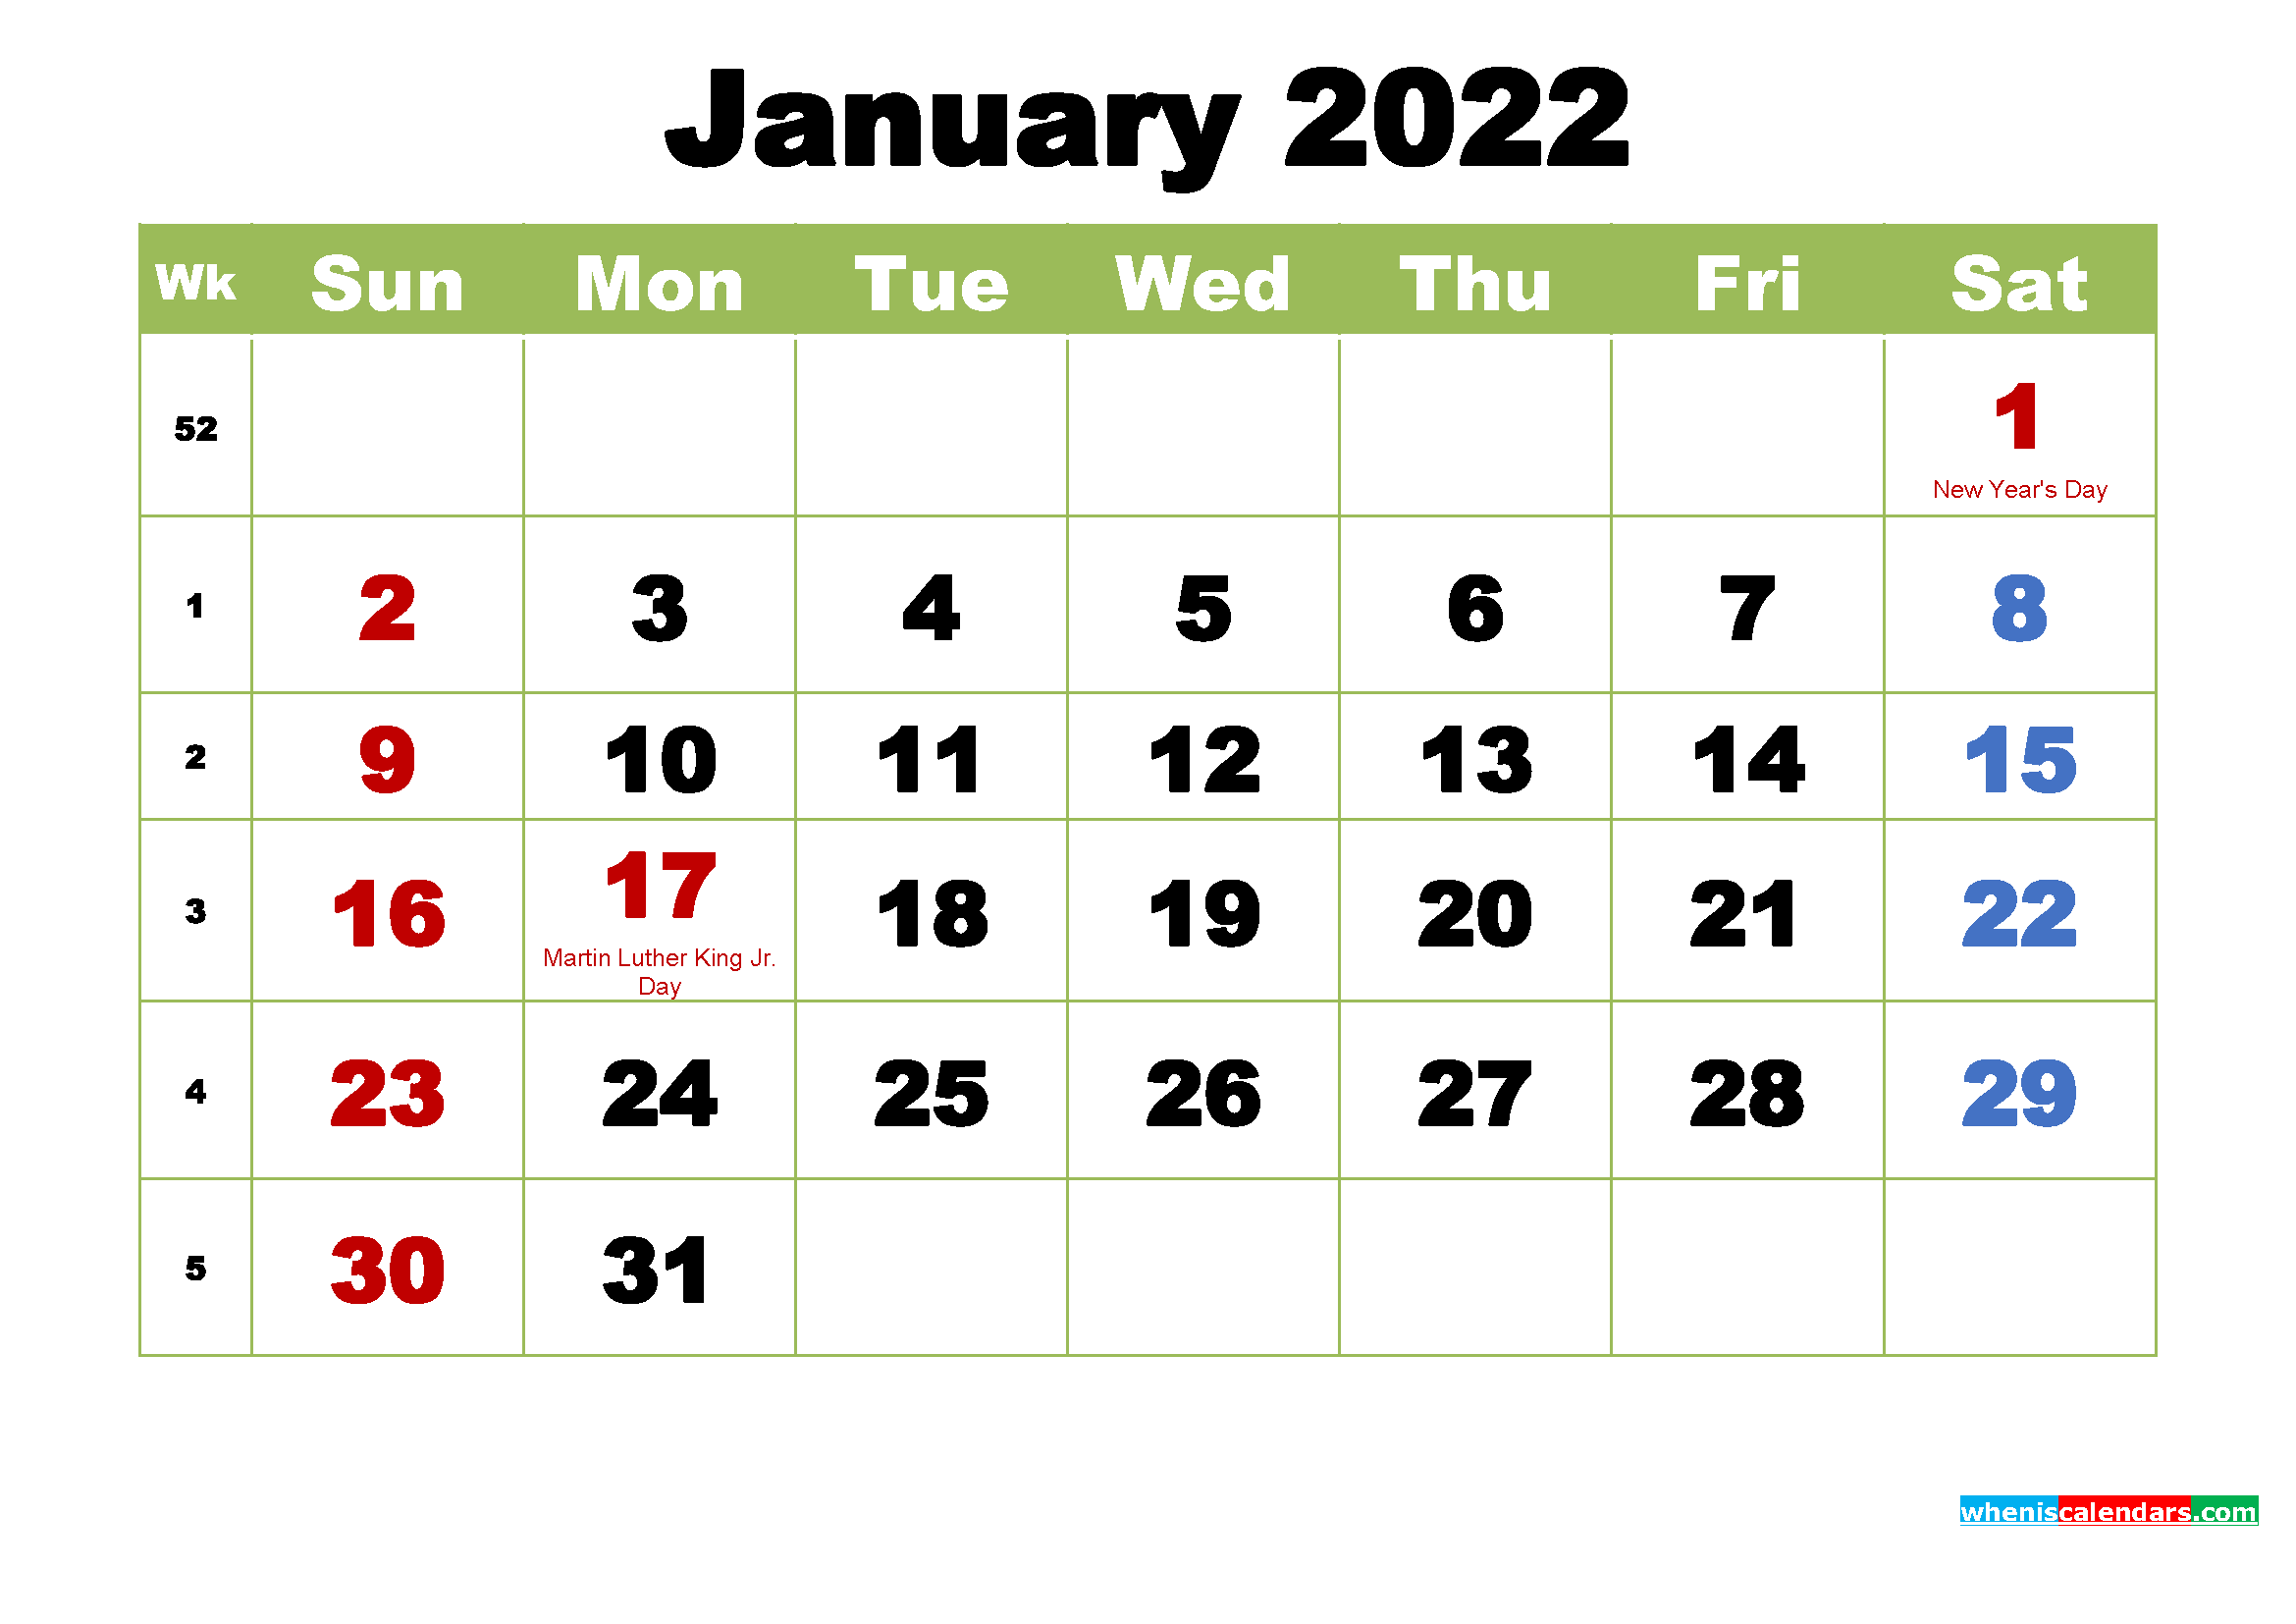 Free January 2022 Printable Calendar with Holidays | Free ...